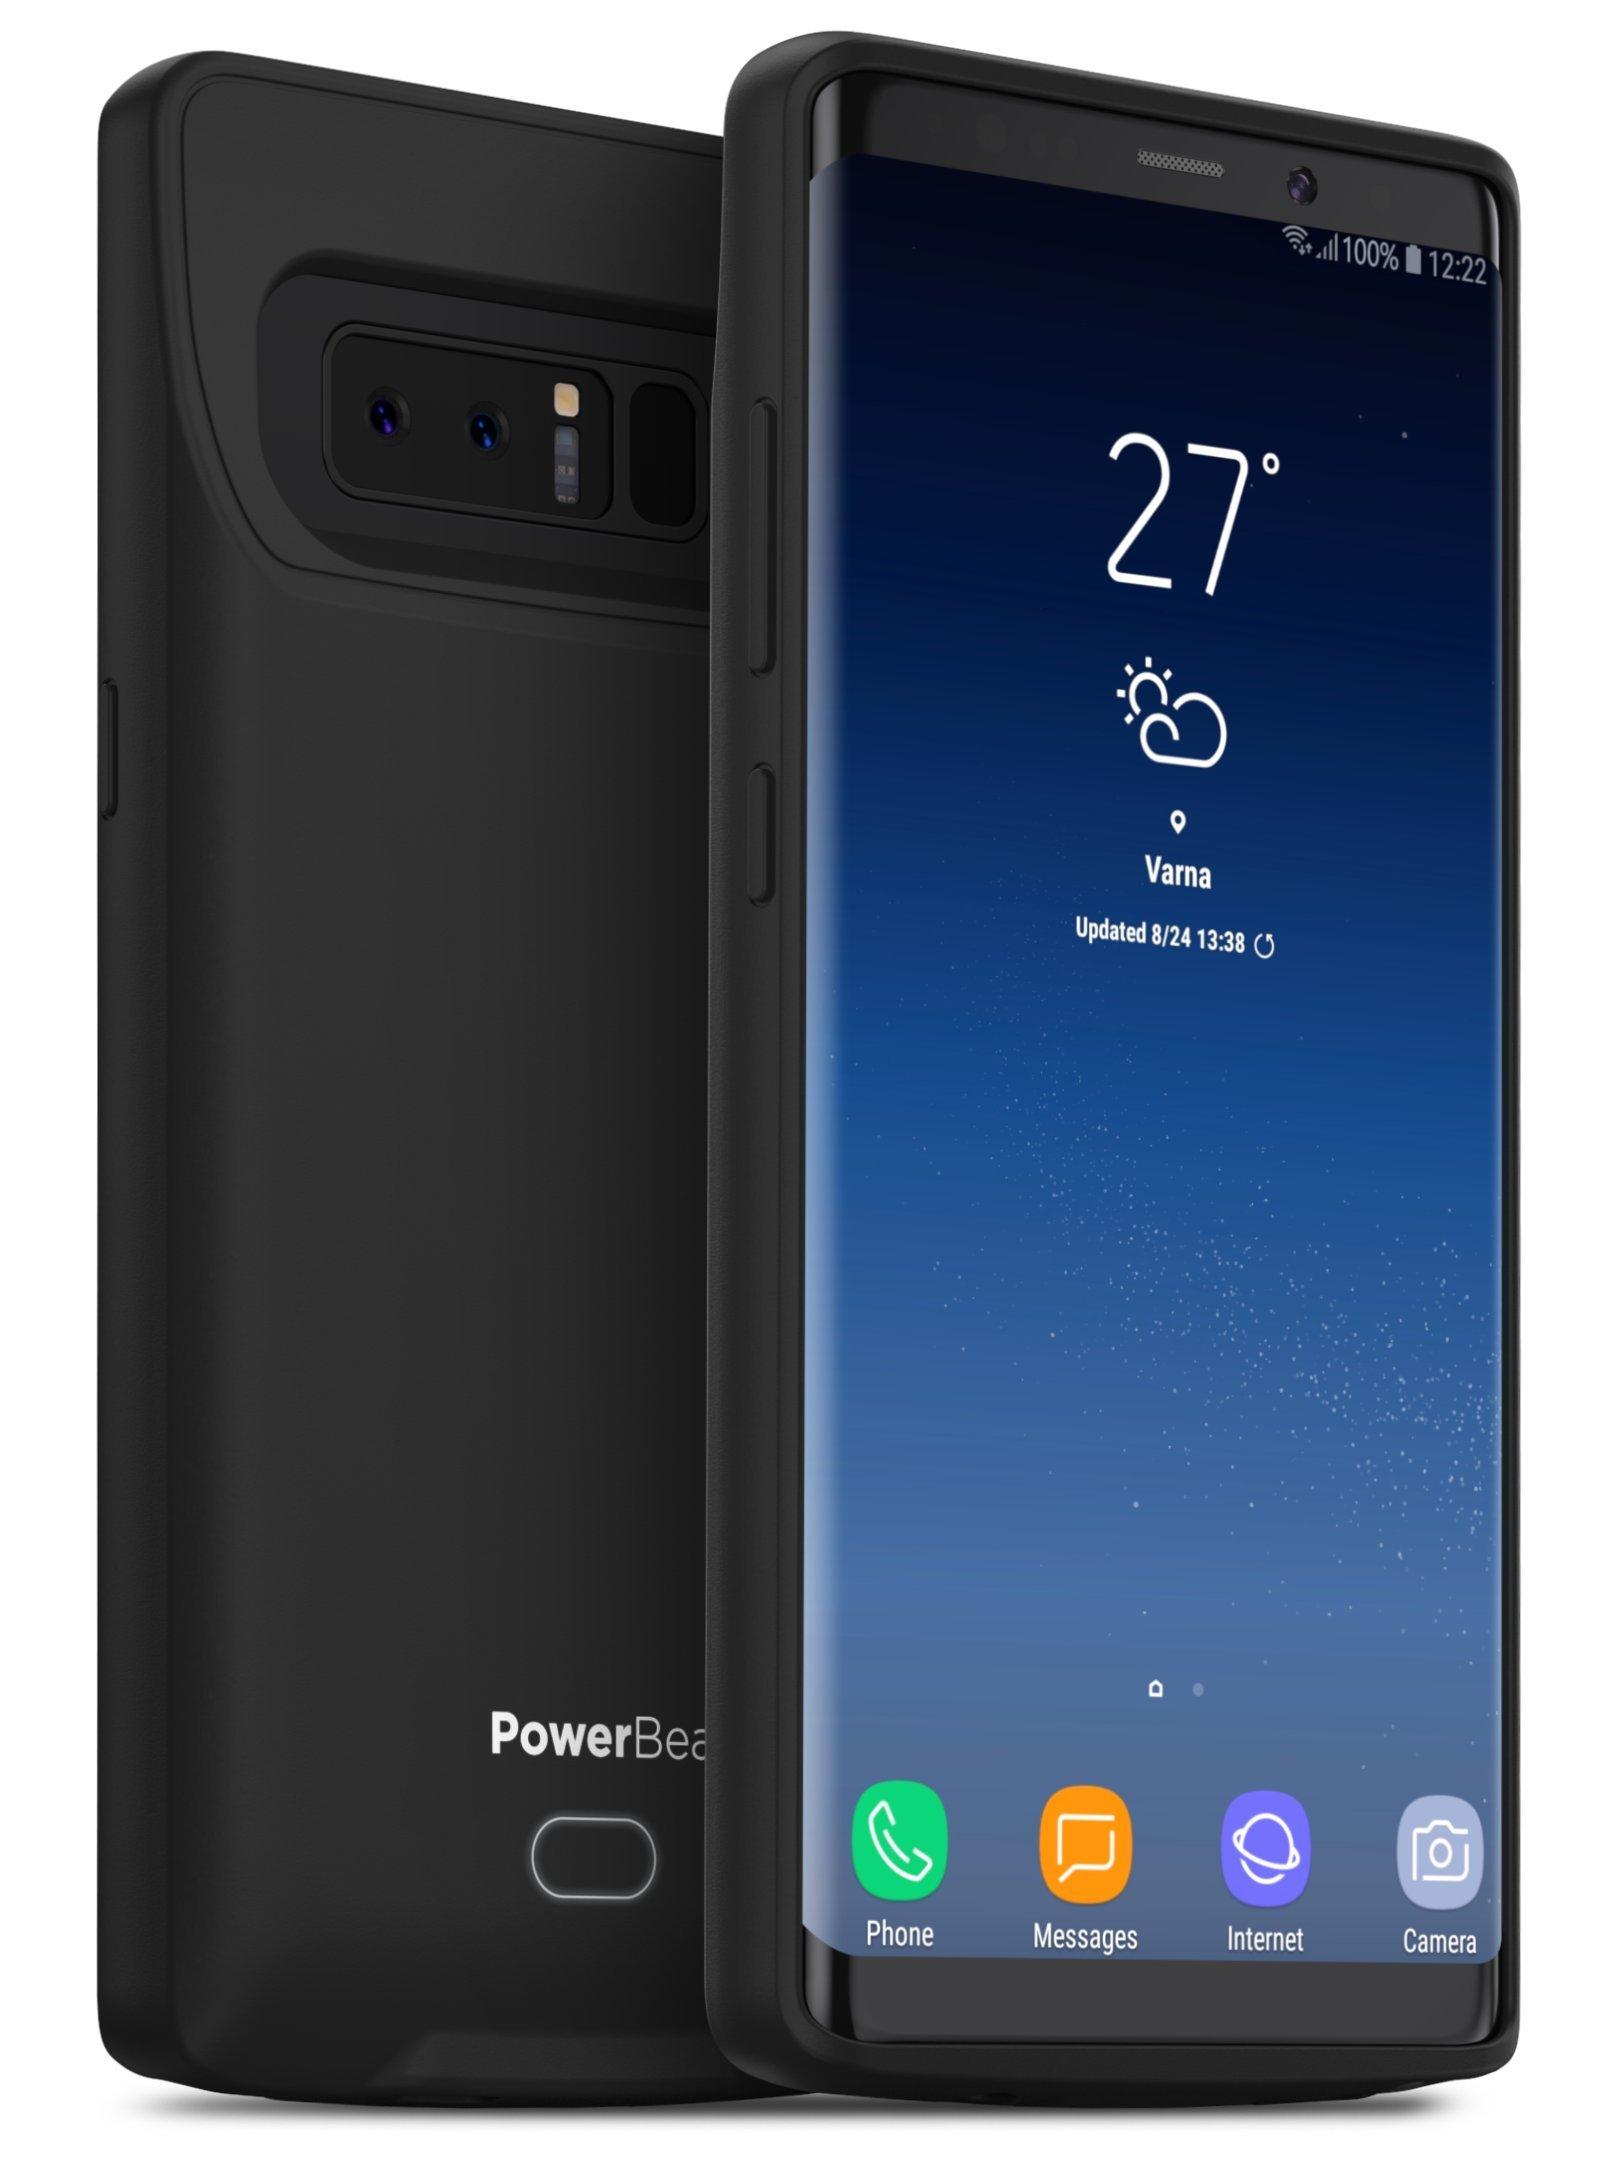 Funda Con Bateria de 4500mah para Samsung Galaxy Note 8 POWERBEAR [7DGJ45B3]